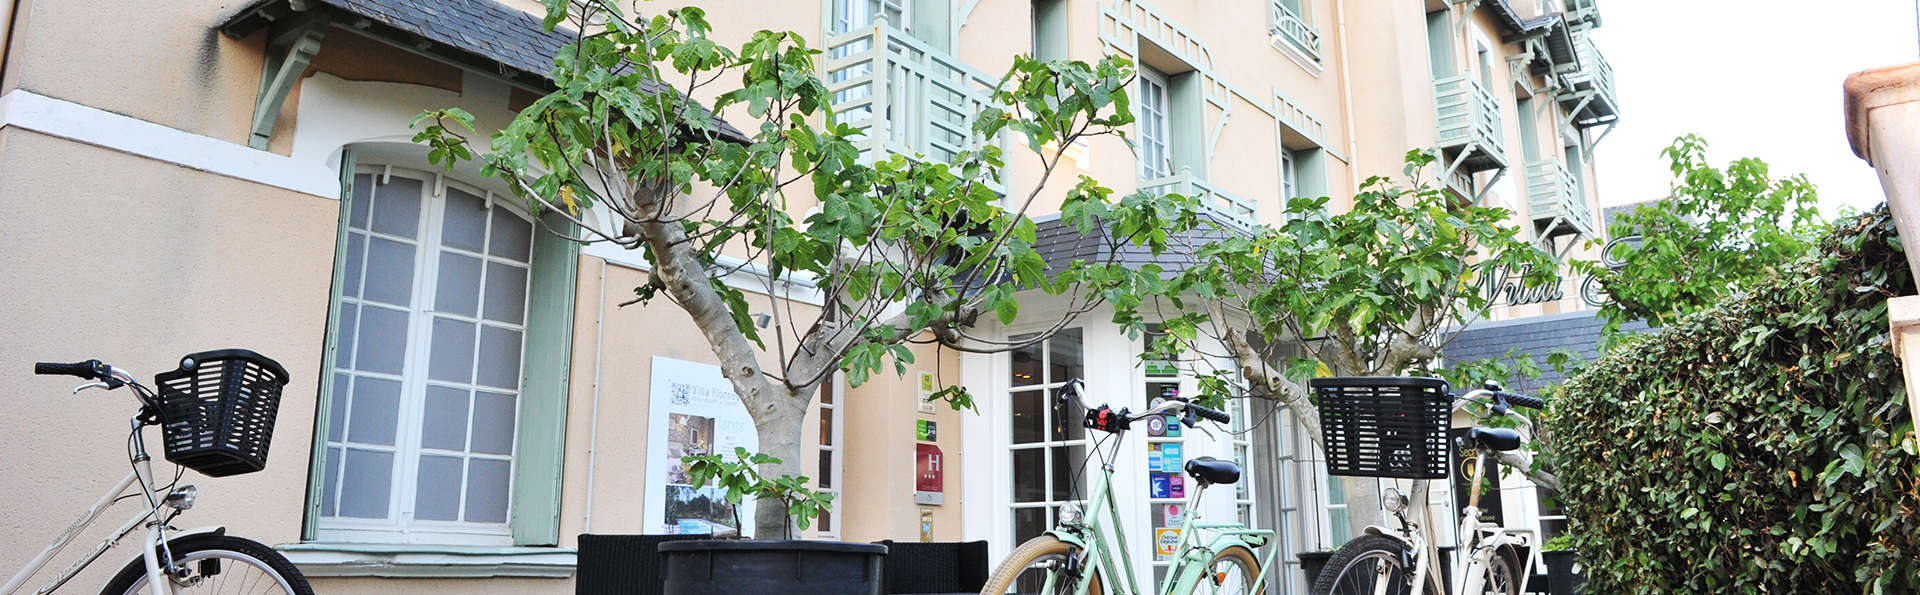 Villa Flornoy - edit_front_bikes.jpg